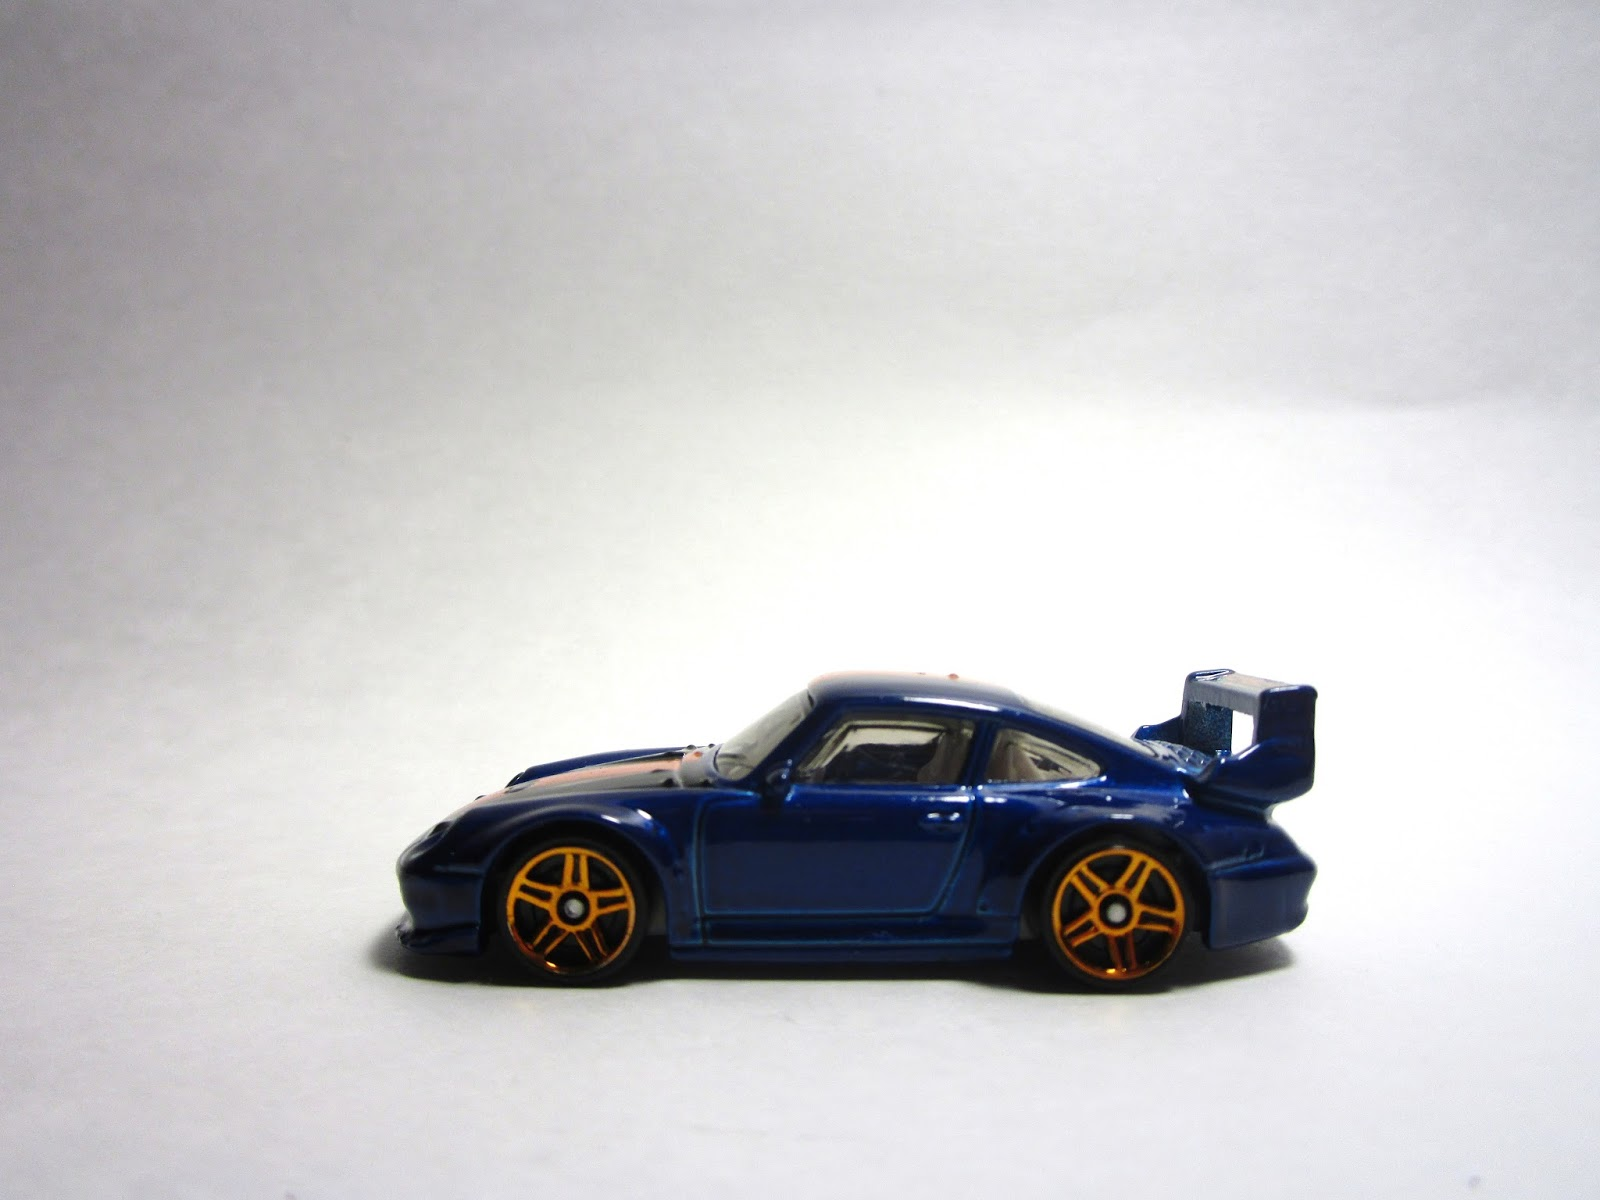 IMG_5939 Outstanding Porsche 911 Gt2 Hot Wheels Cars Trend